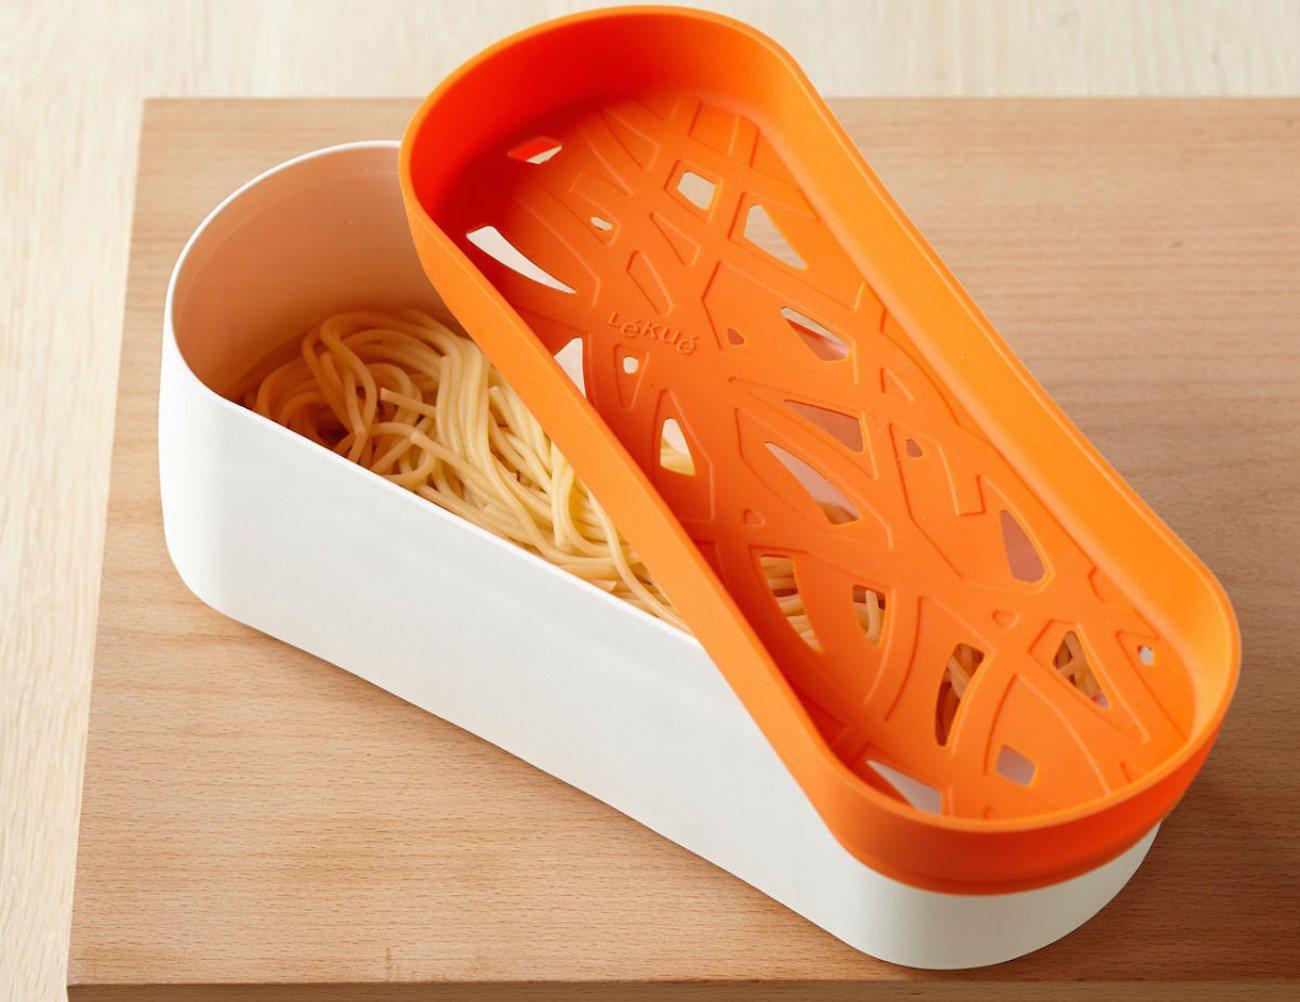 Lekue Microwave Friendly Pasta Cooker